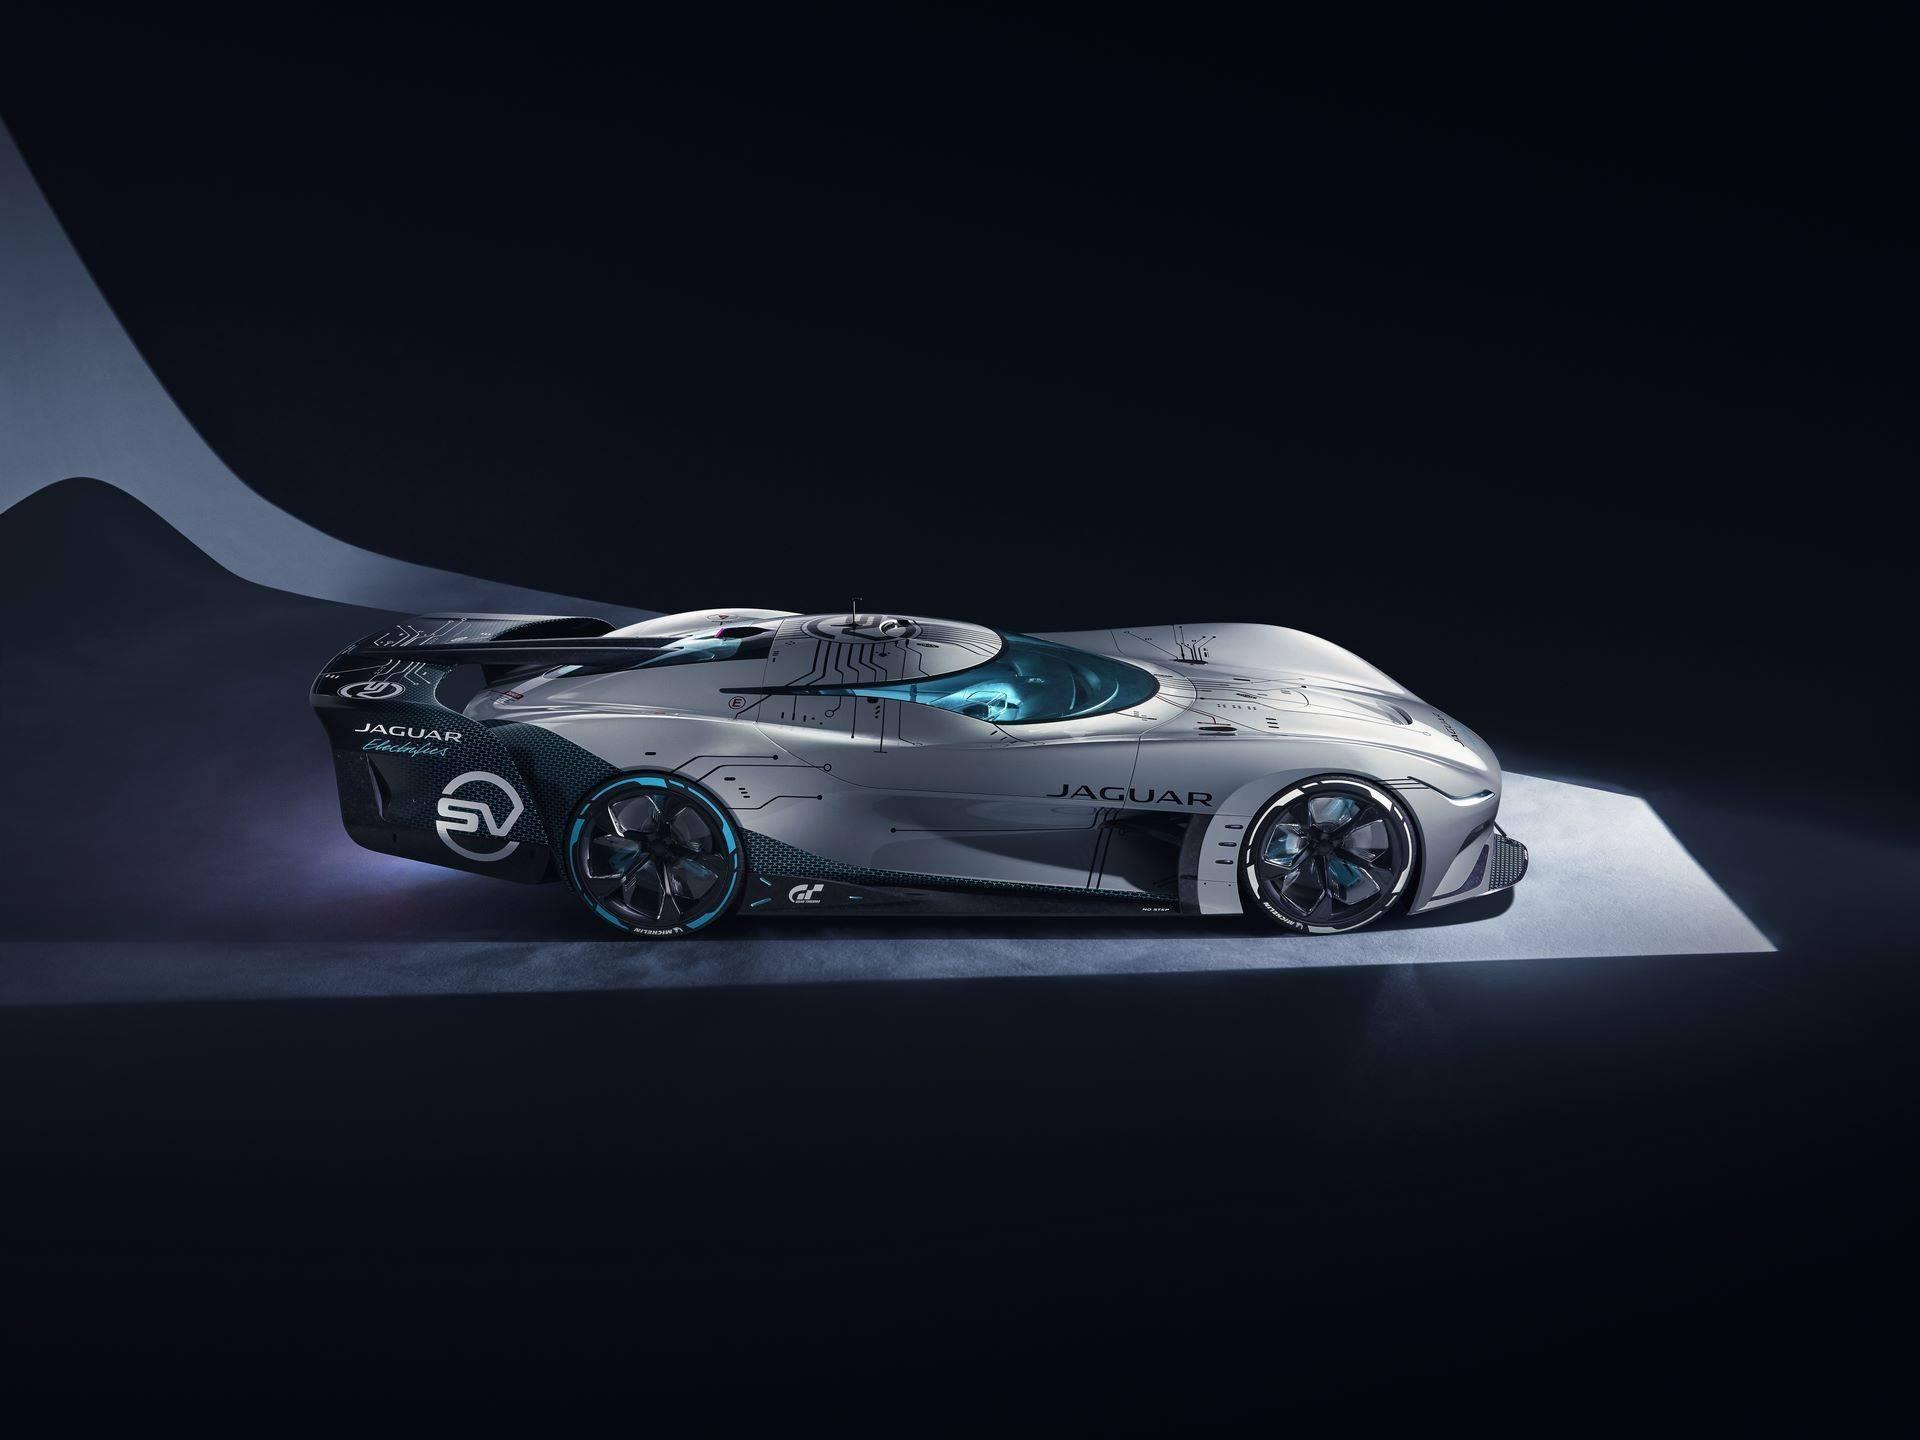 Jaguar-Vision-Gran-Turismo-SV-28